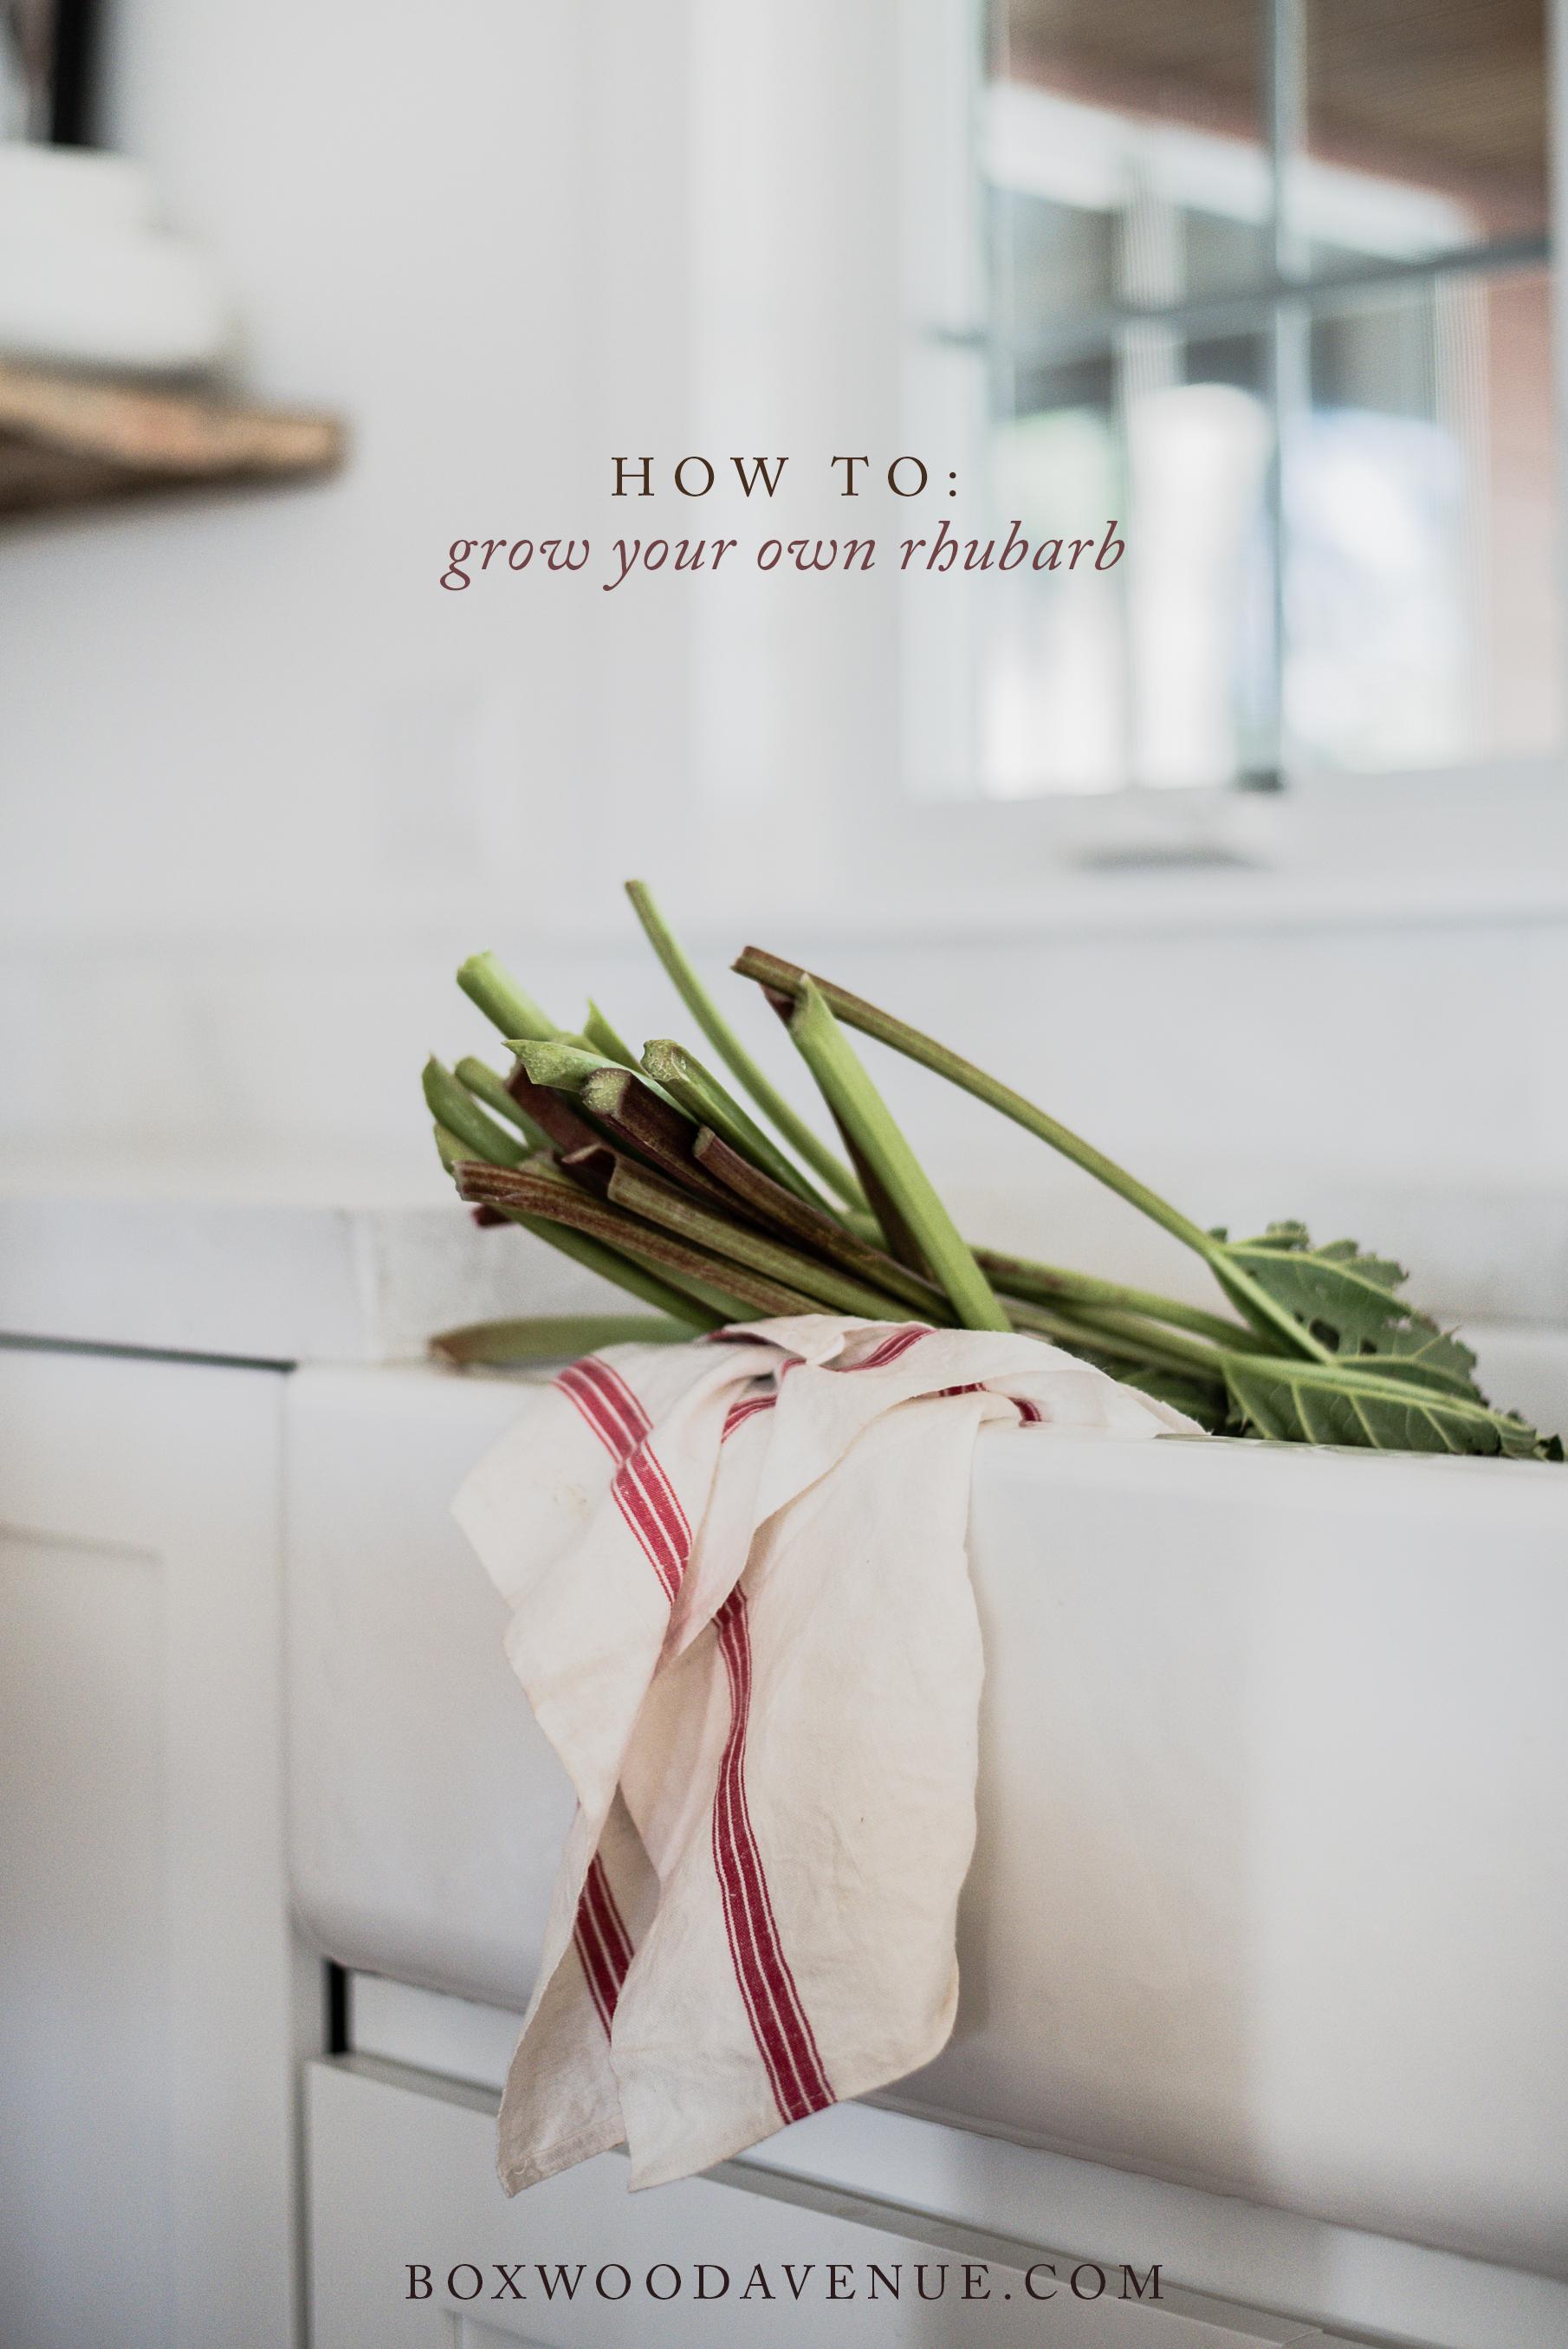 Simple recipes & beautiful rhubarb photography... How to grow rhubarb! | boxwoodavenue.com